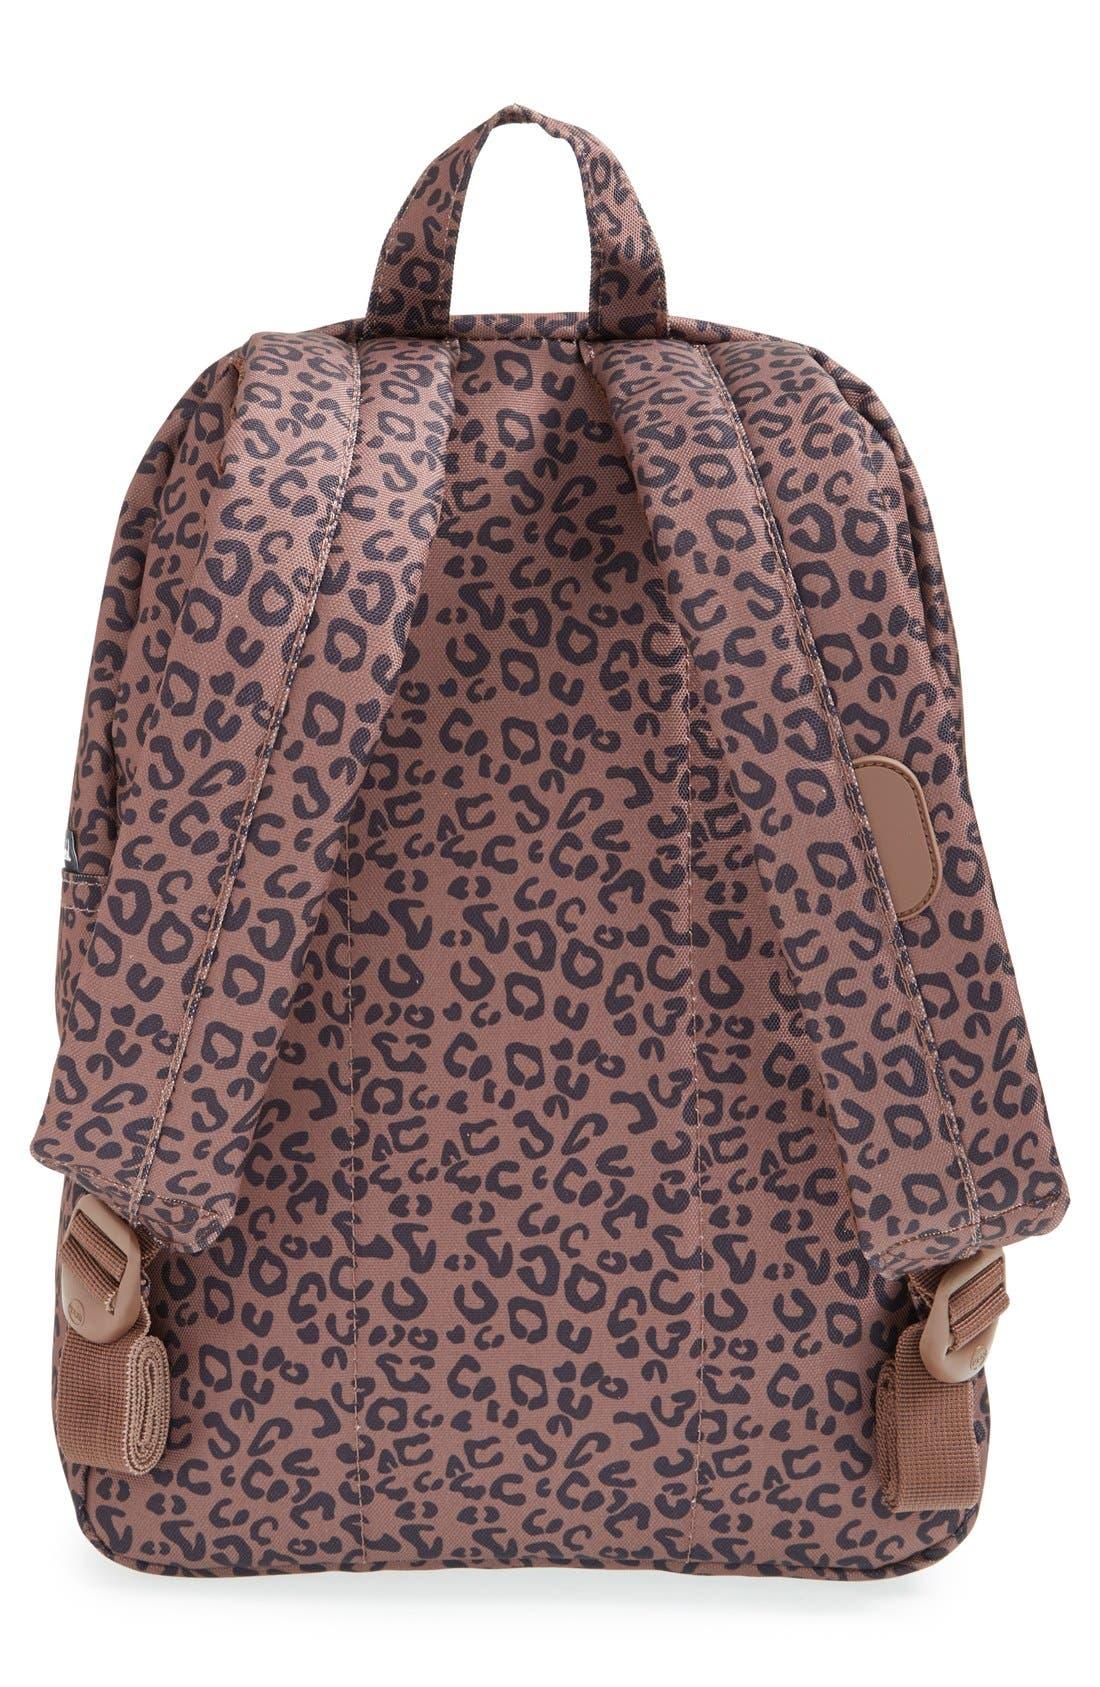 'Settlement - Leopard Print' Backpack,                             Alternate thumbnail 4, color,                             001